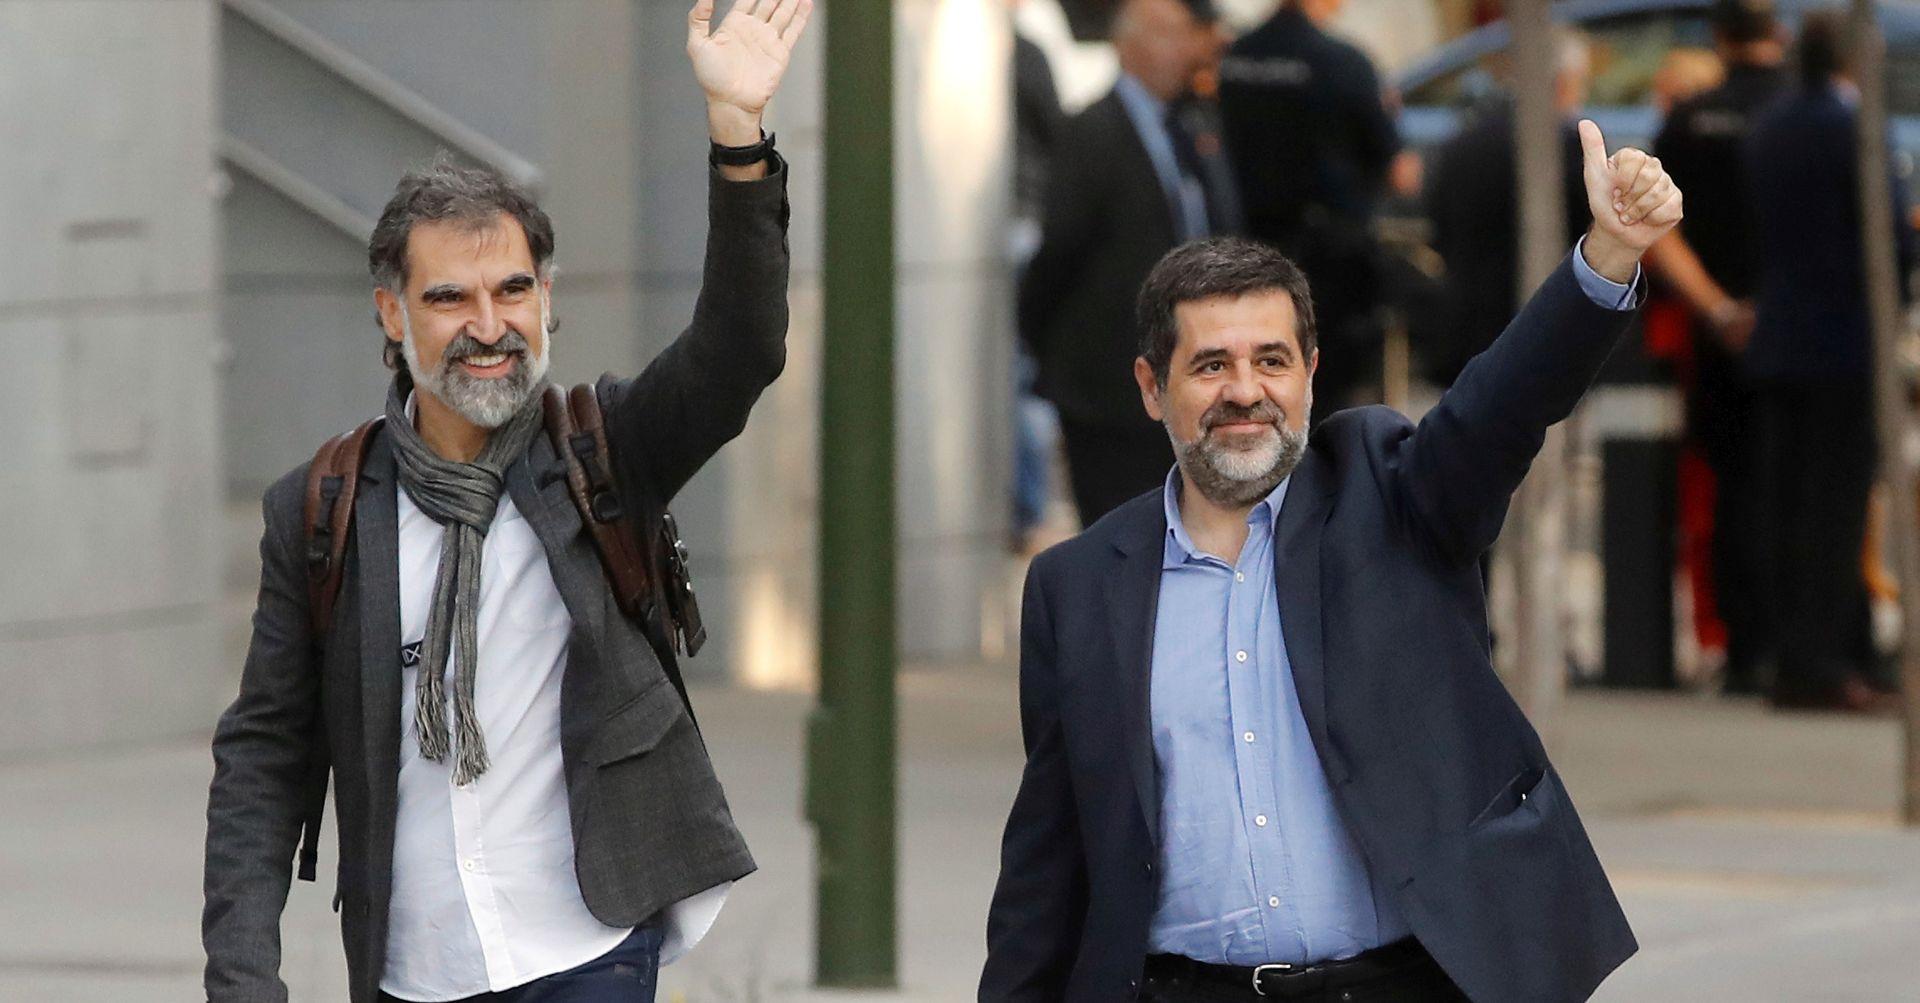 Španjolski Visoki sud pritvorio dva katalonska separatistička čelnika